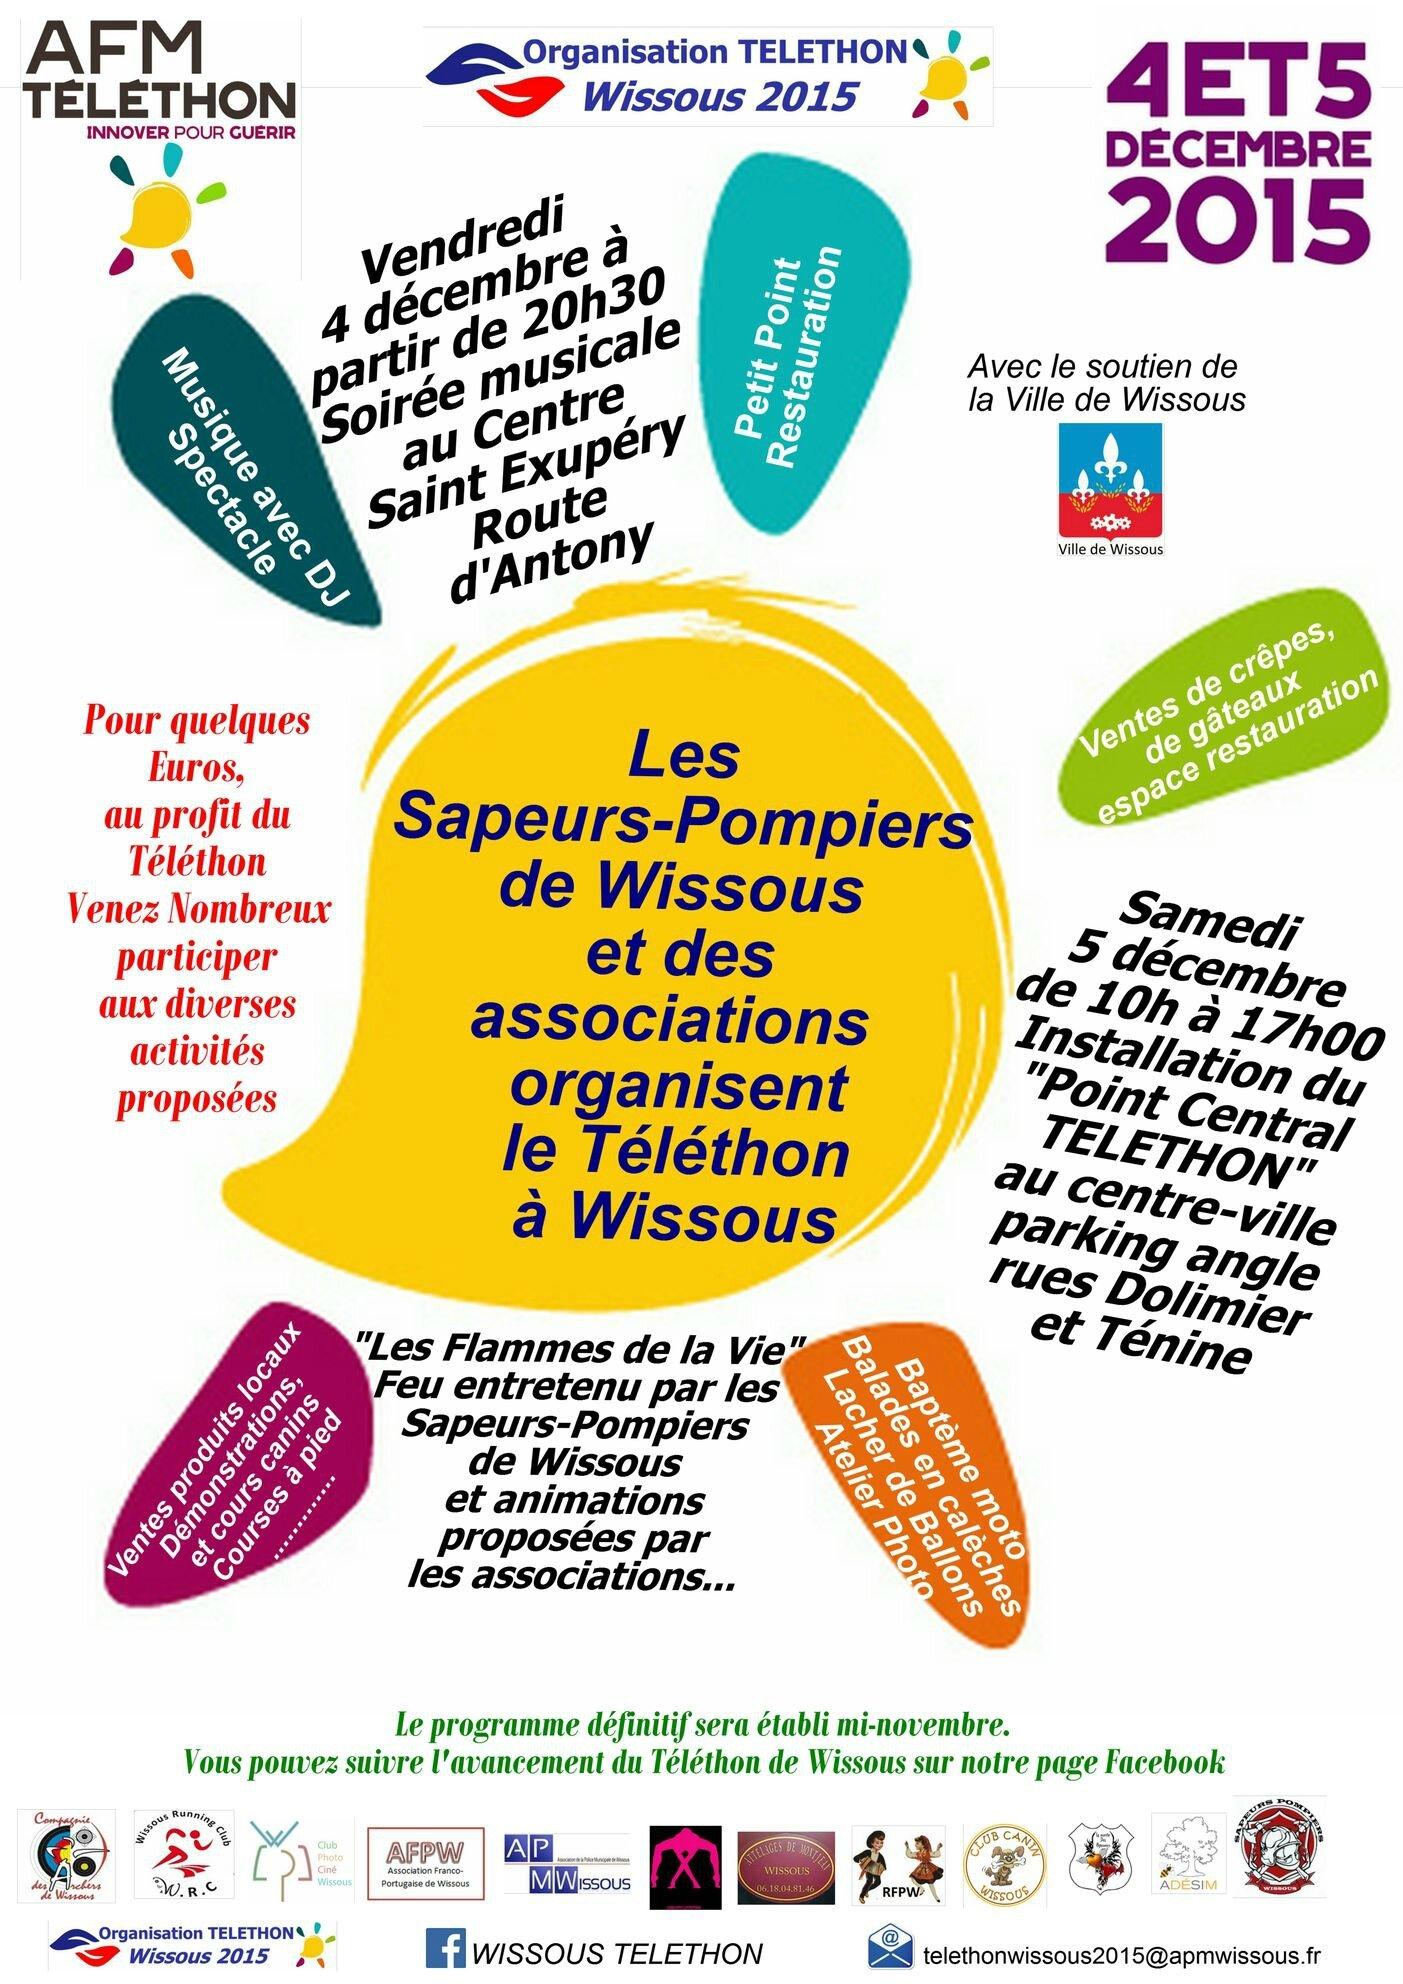 2015.12.05 Téléthon 2015